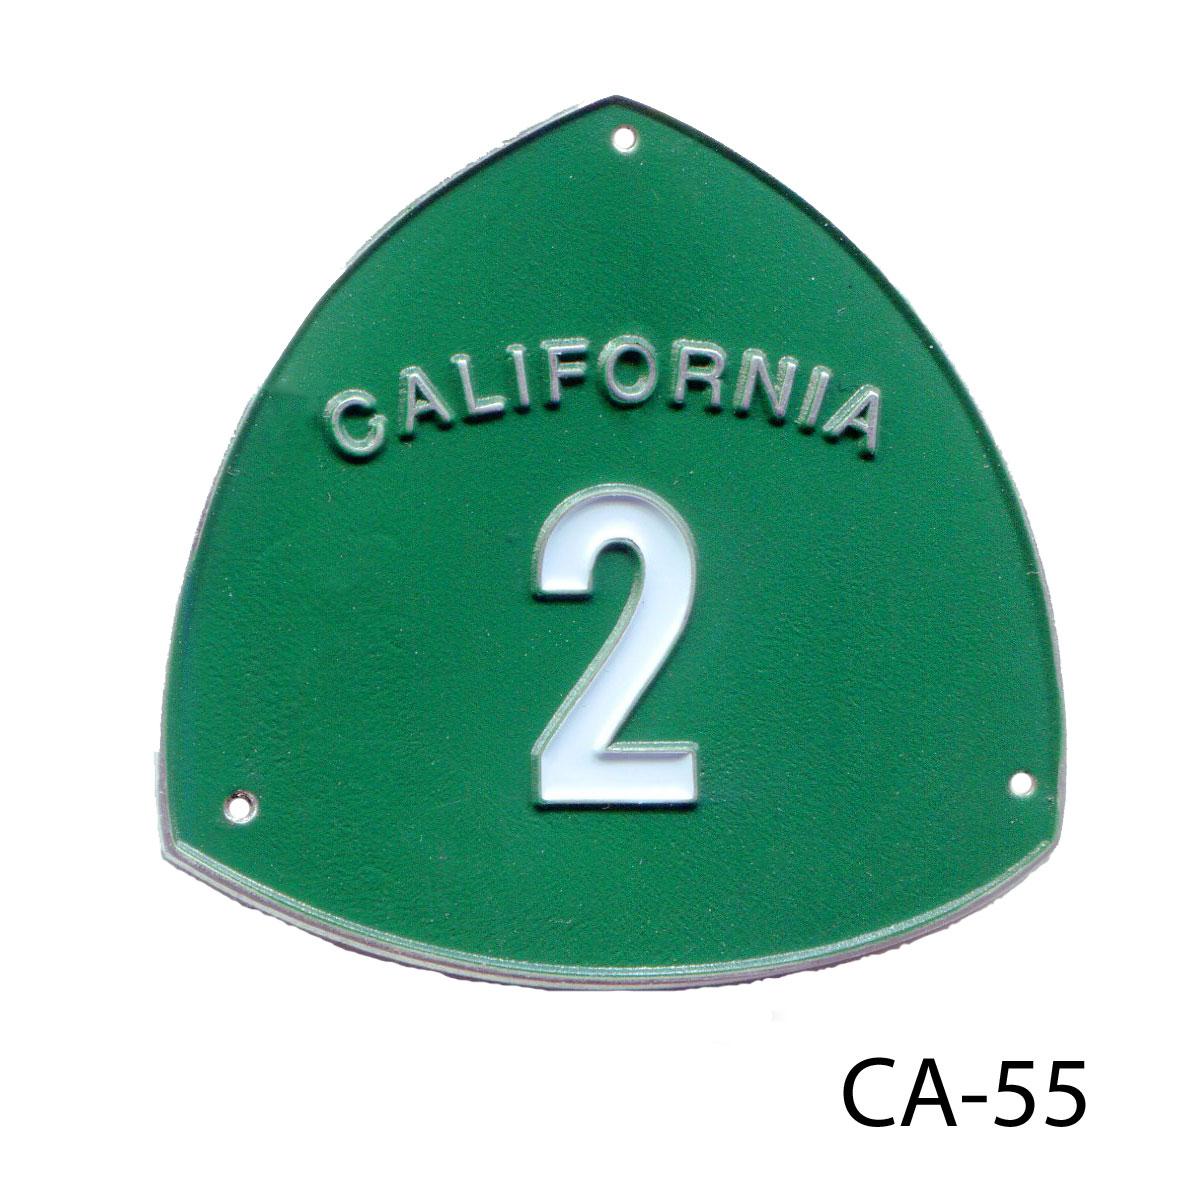 California state route 2 hike america california state route 2 buycottarizona